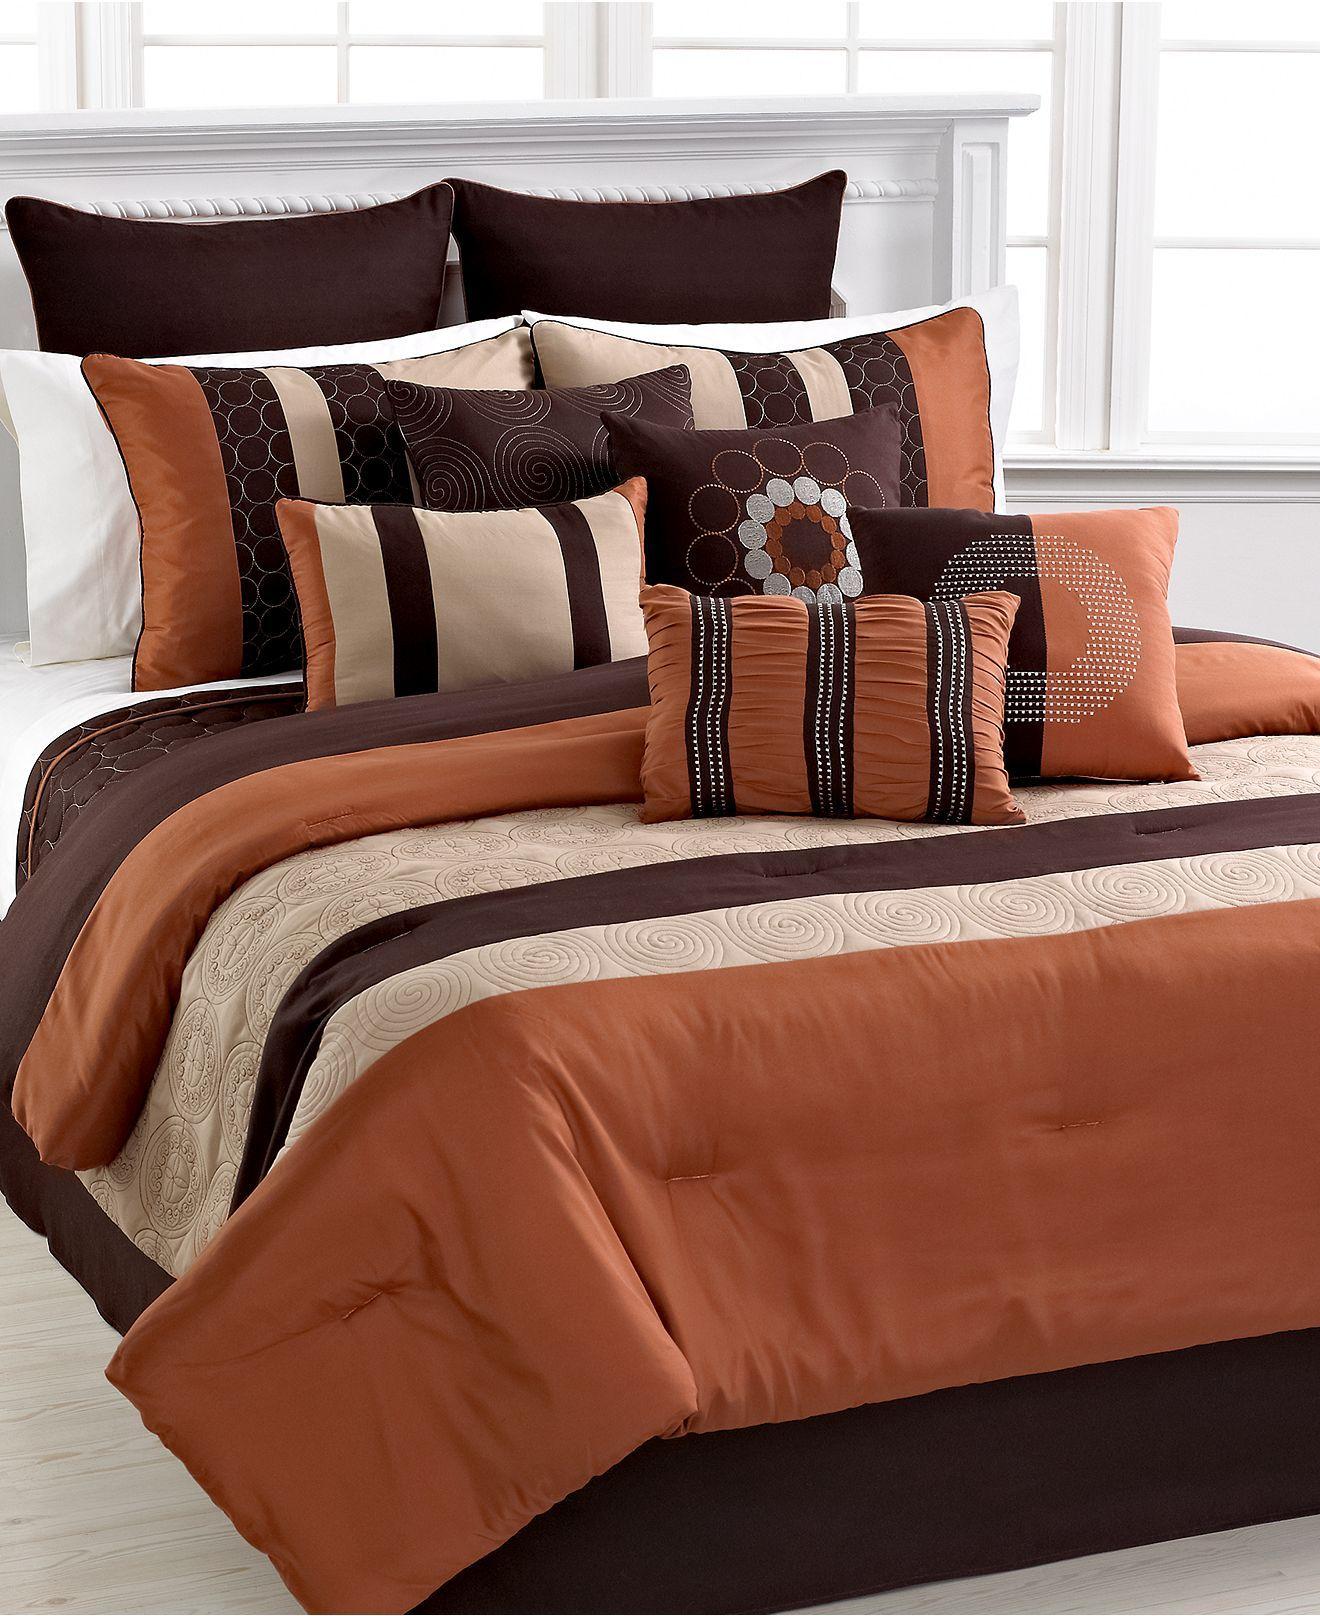 Pin By Carmen Bonello On Crutins Comforters Bedroom Comforter